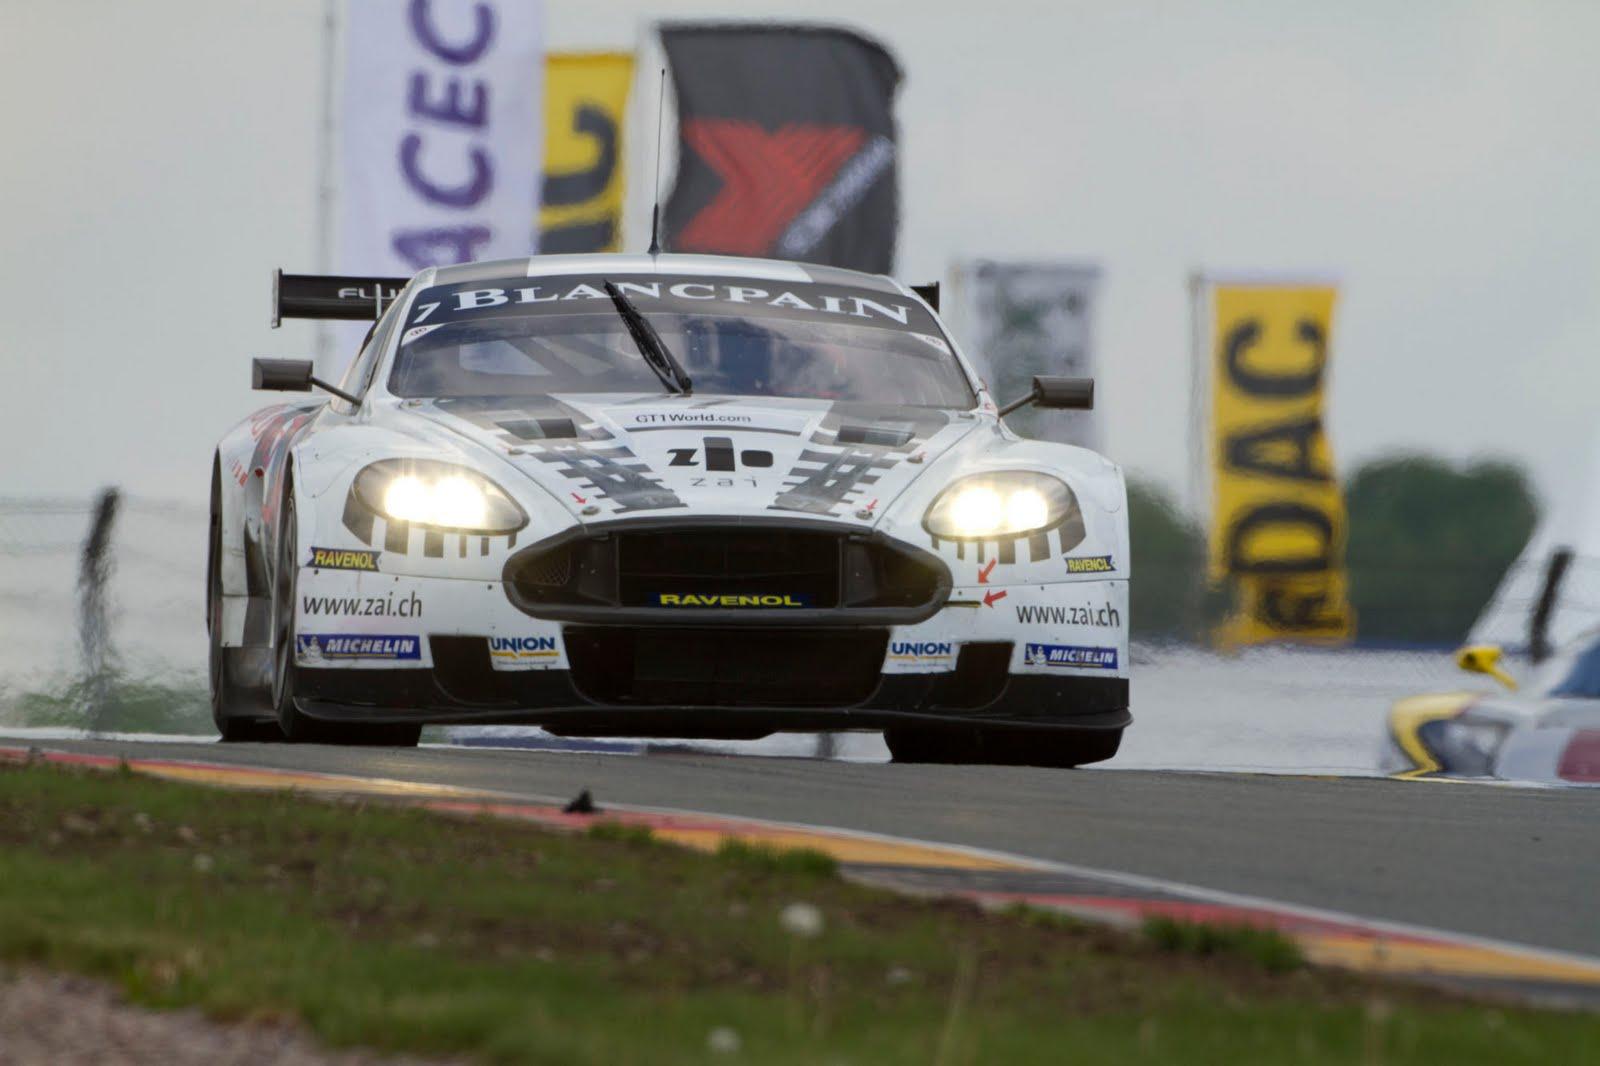 The GT1-World Championship